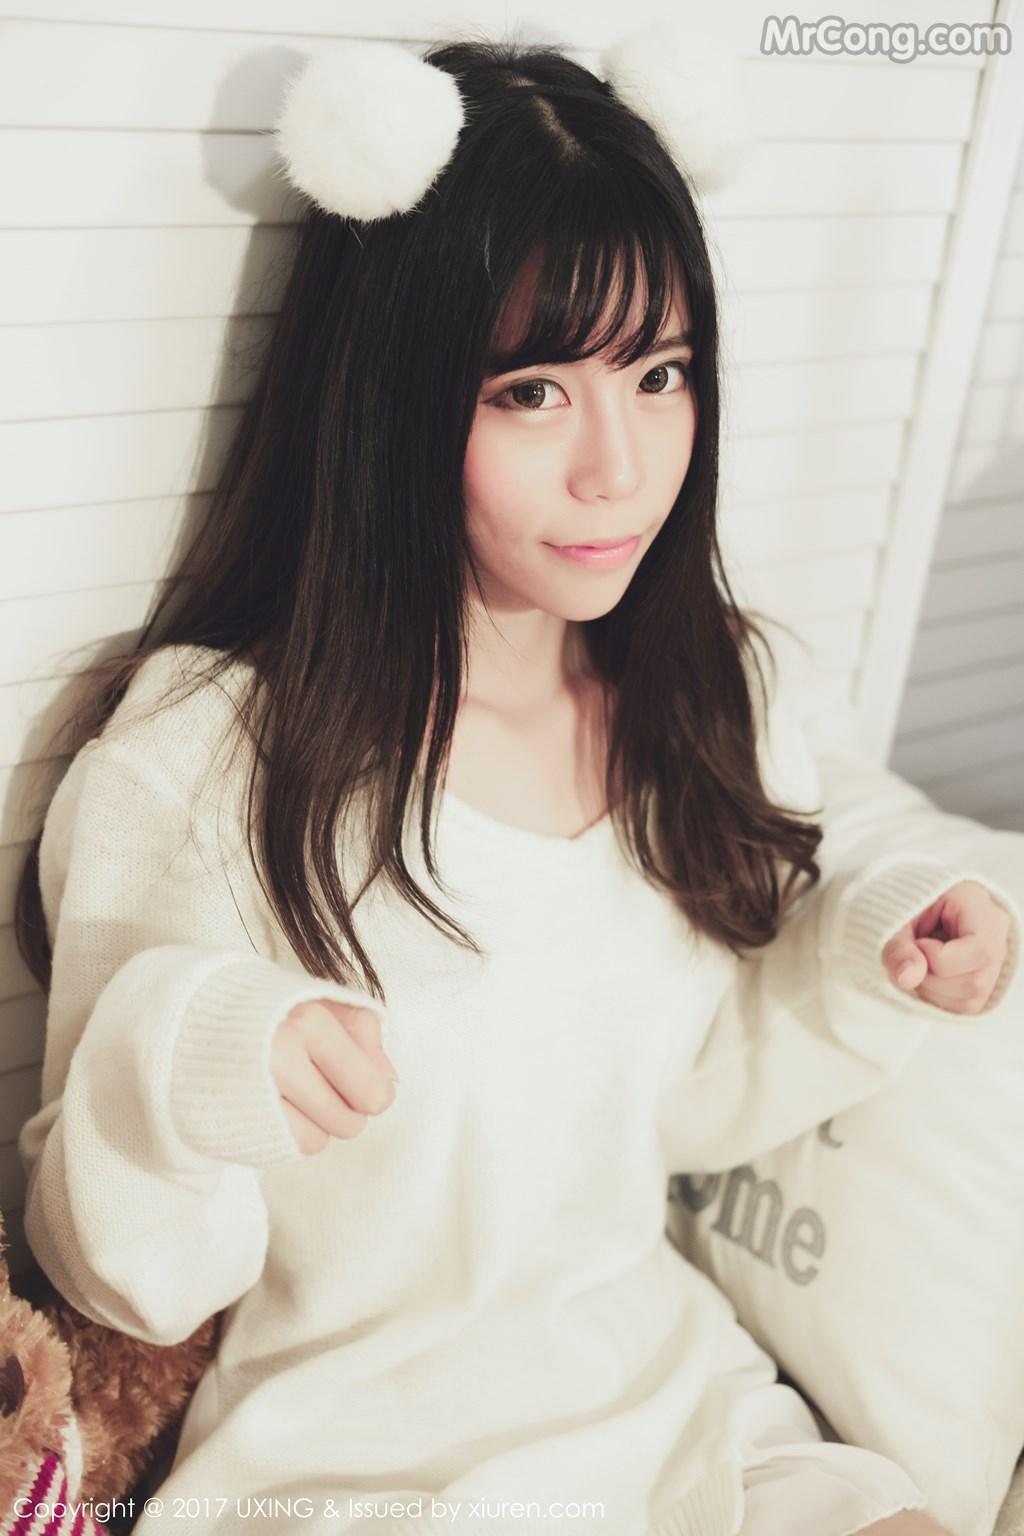 Image UXING-Vol.048-Yo-Jiang-MrCong.com-007 in post UXING Vol.048: Người mẫu Yo酱 (33 ảnh)